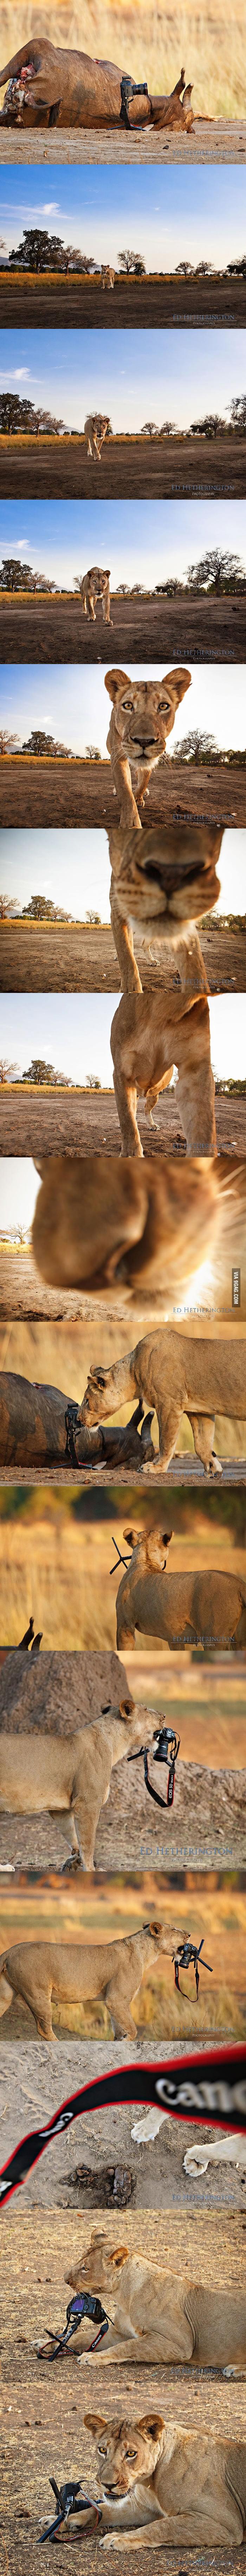 Lion stealing camera.